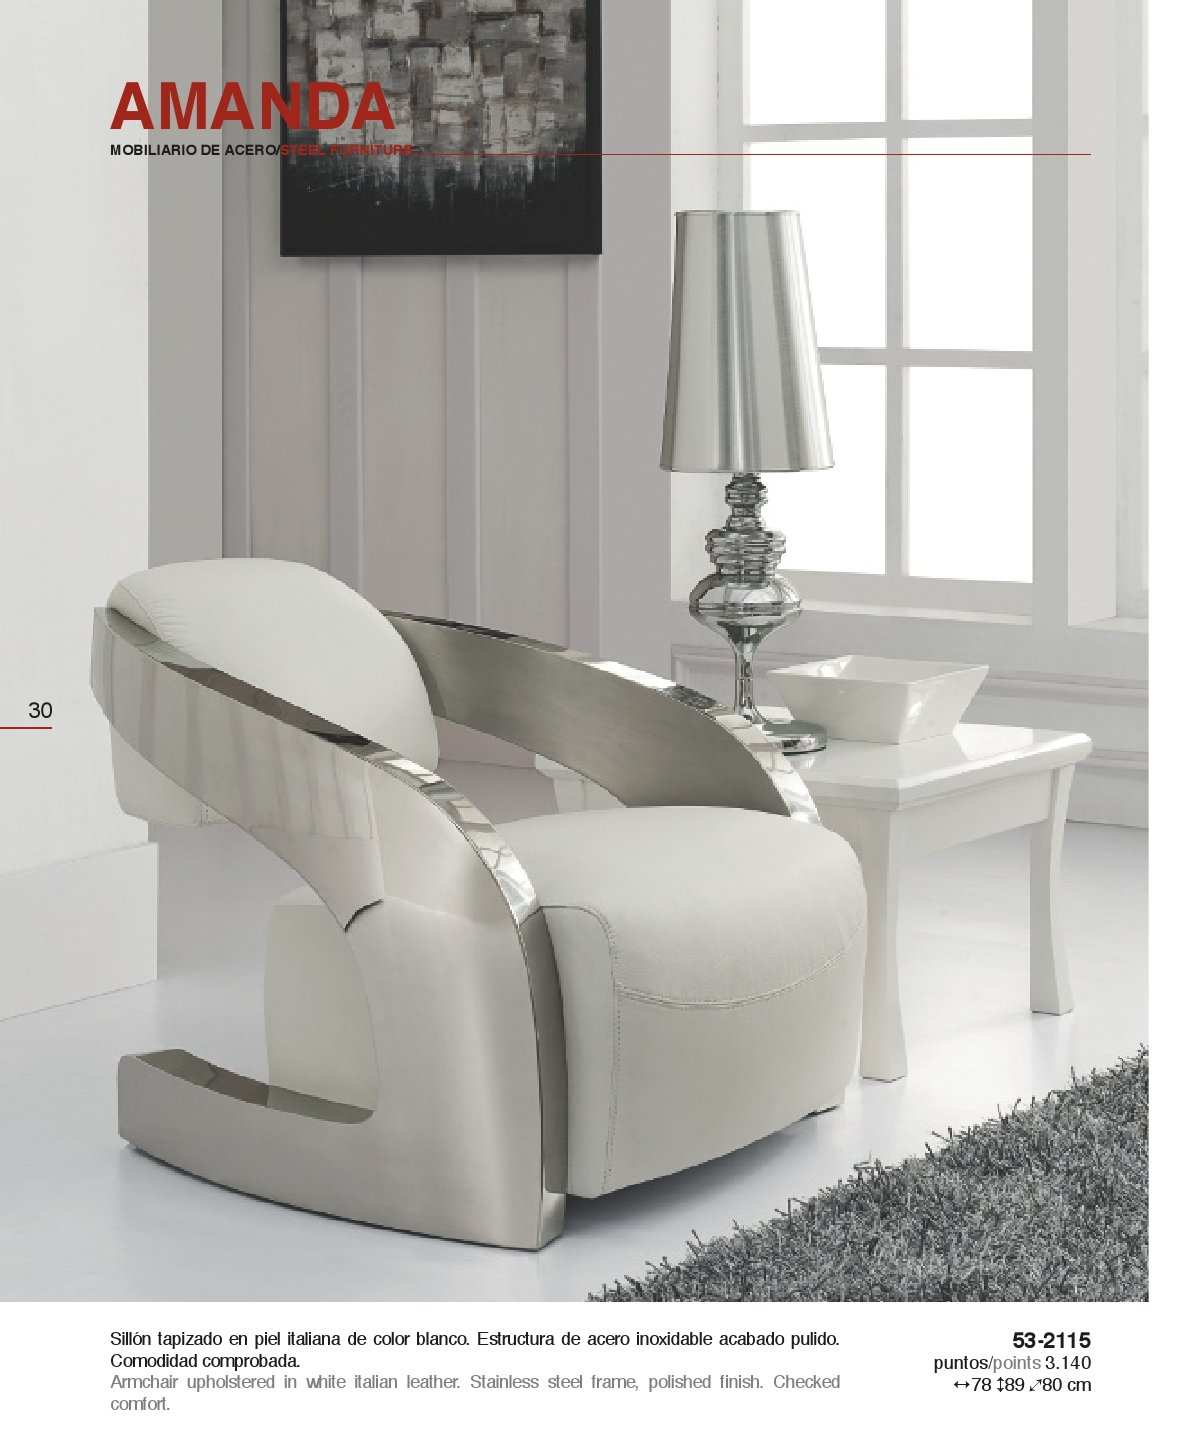 Amanda sillón blanco piel italiana Schuller Foto